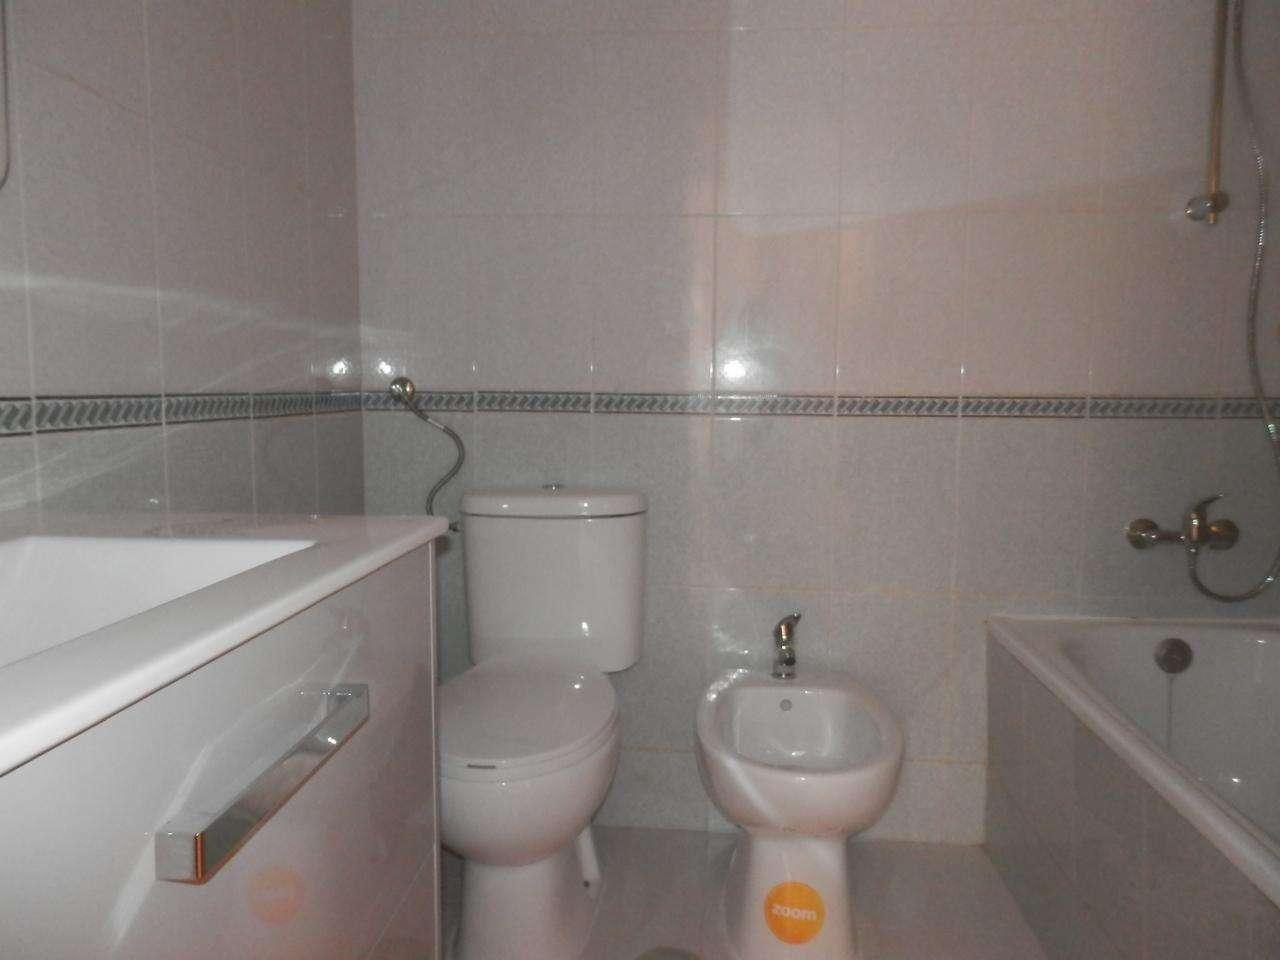 Apartamento para comprar, Rio de Mouro, Sintra, Lisboa - Foto 8